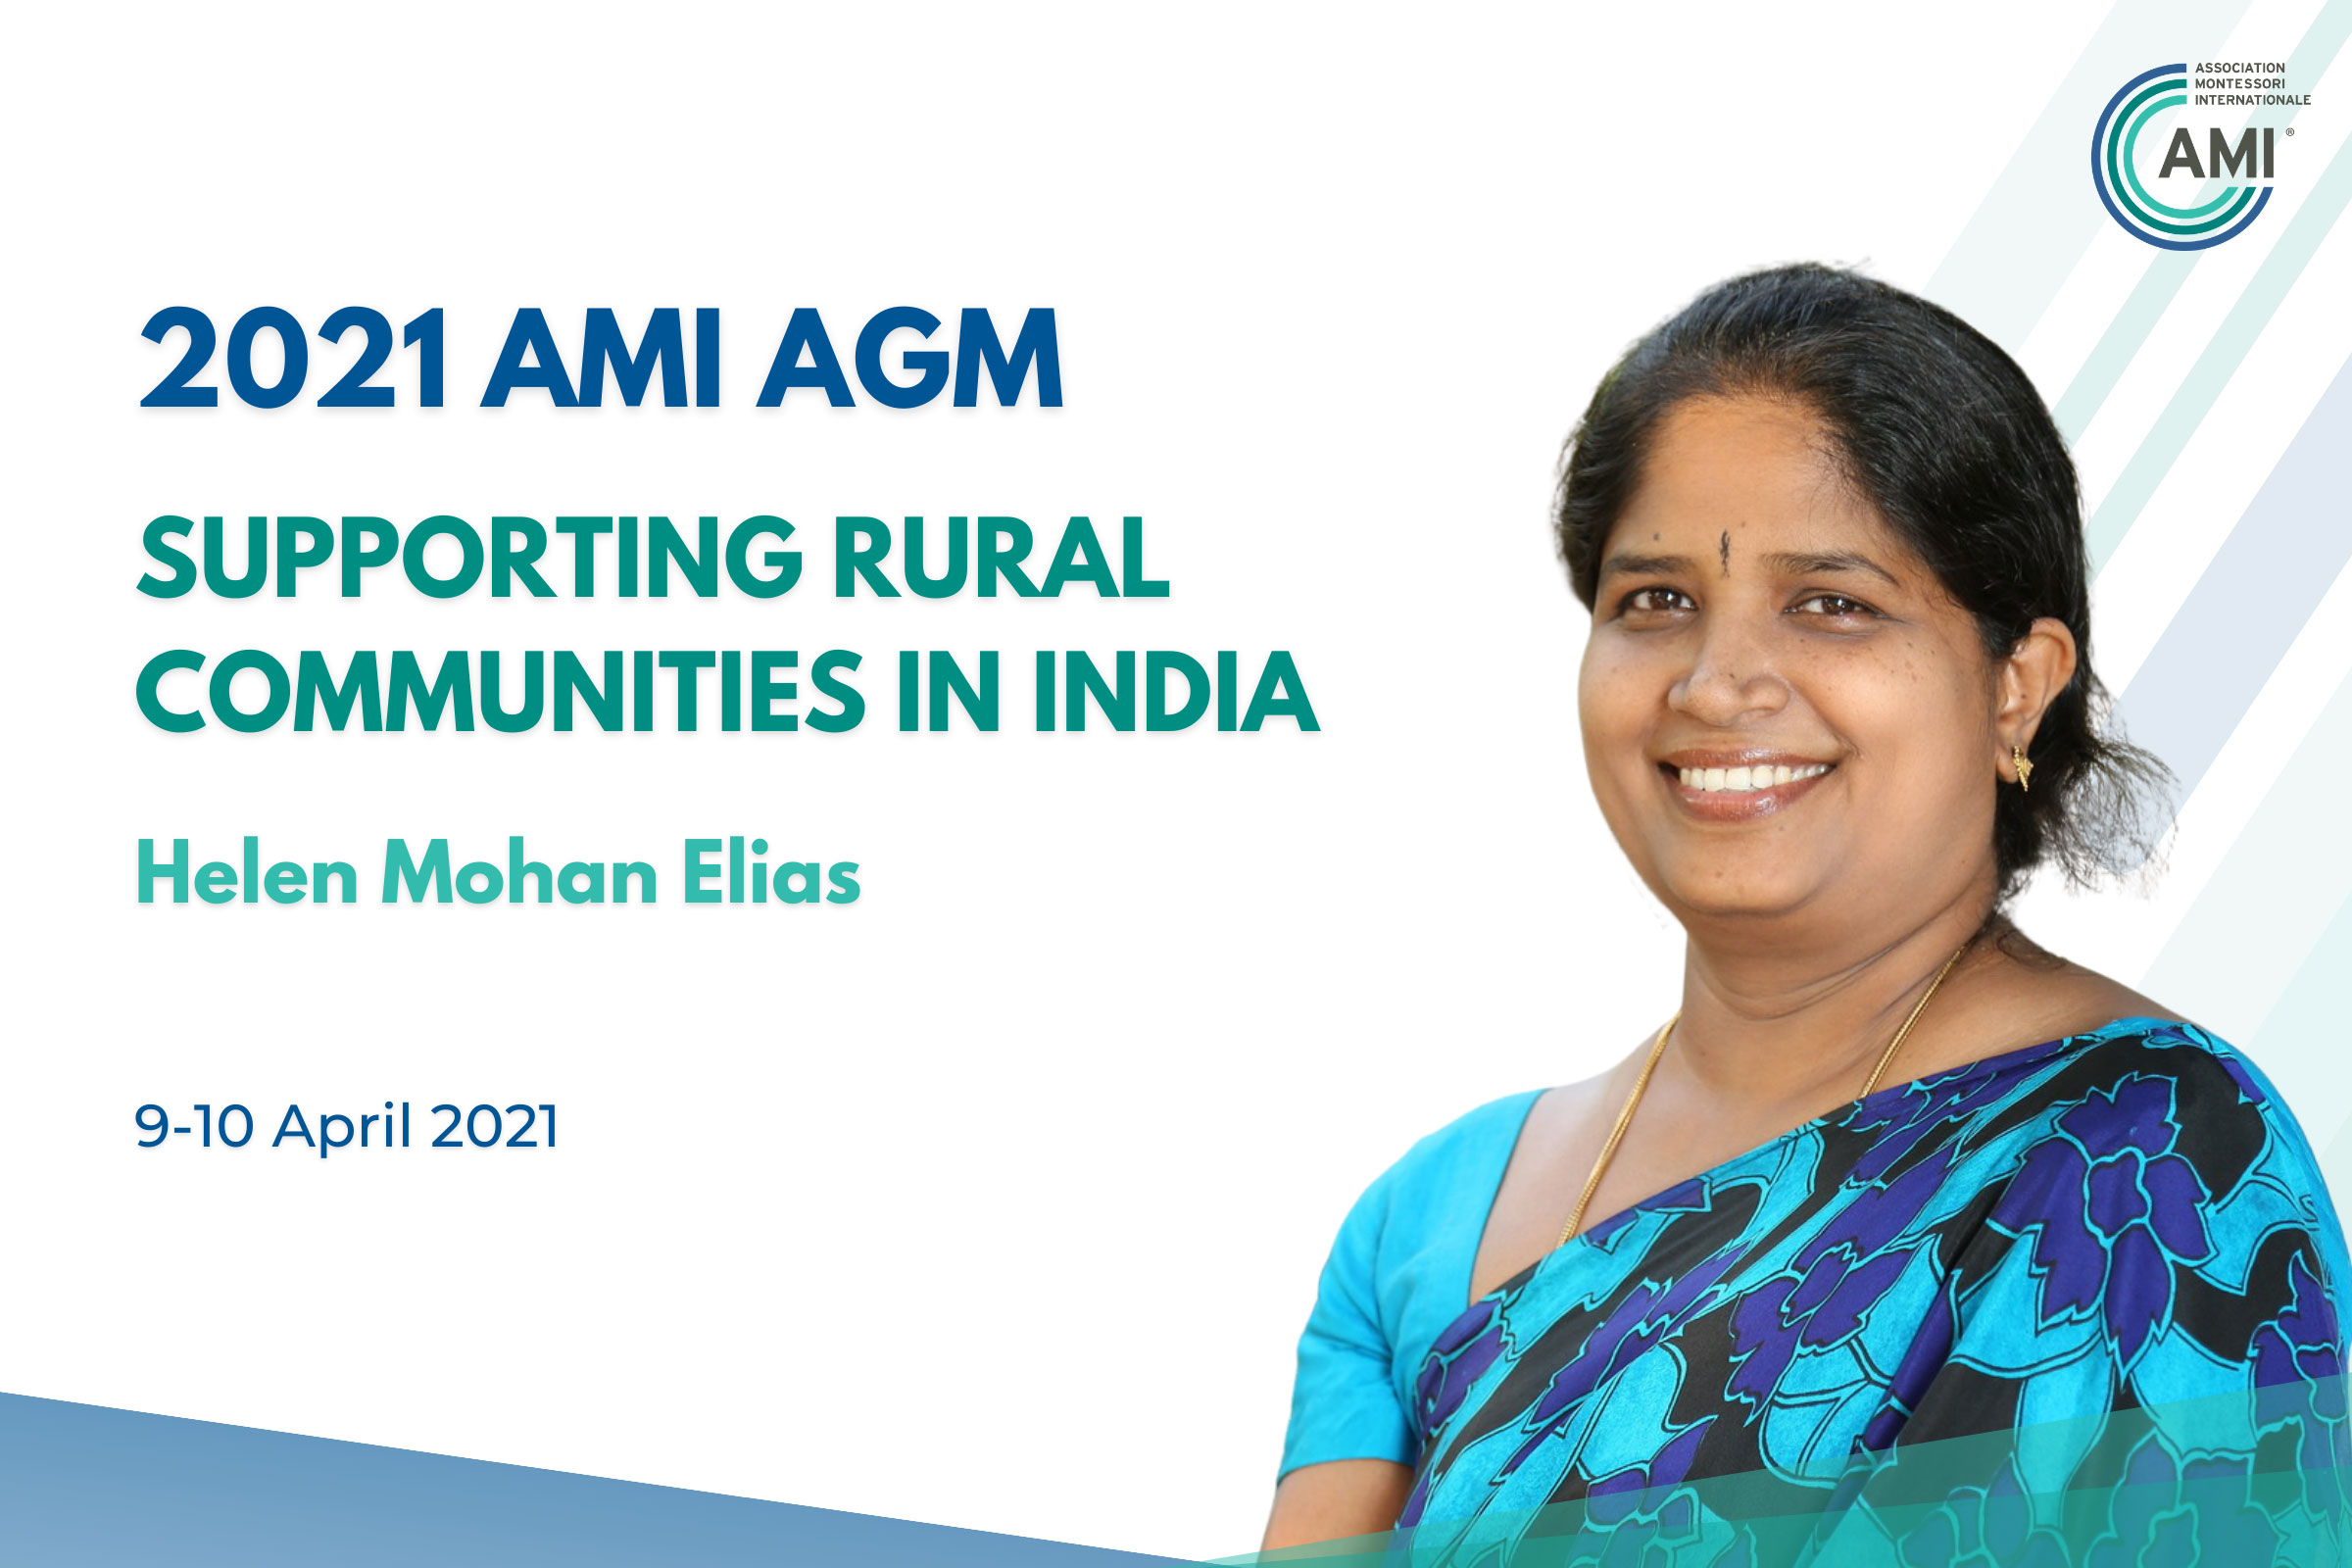 AMI AGM Speakers Helen Mohan Elias